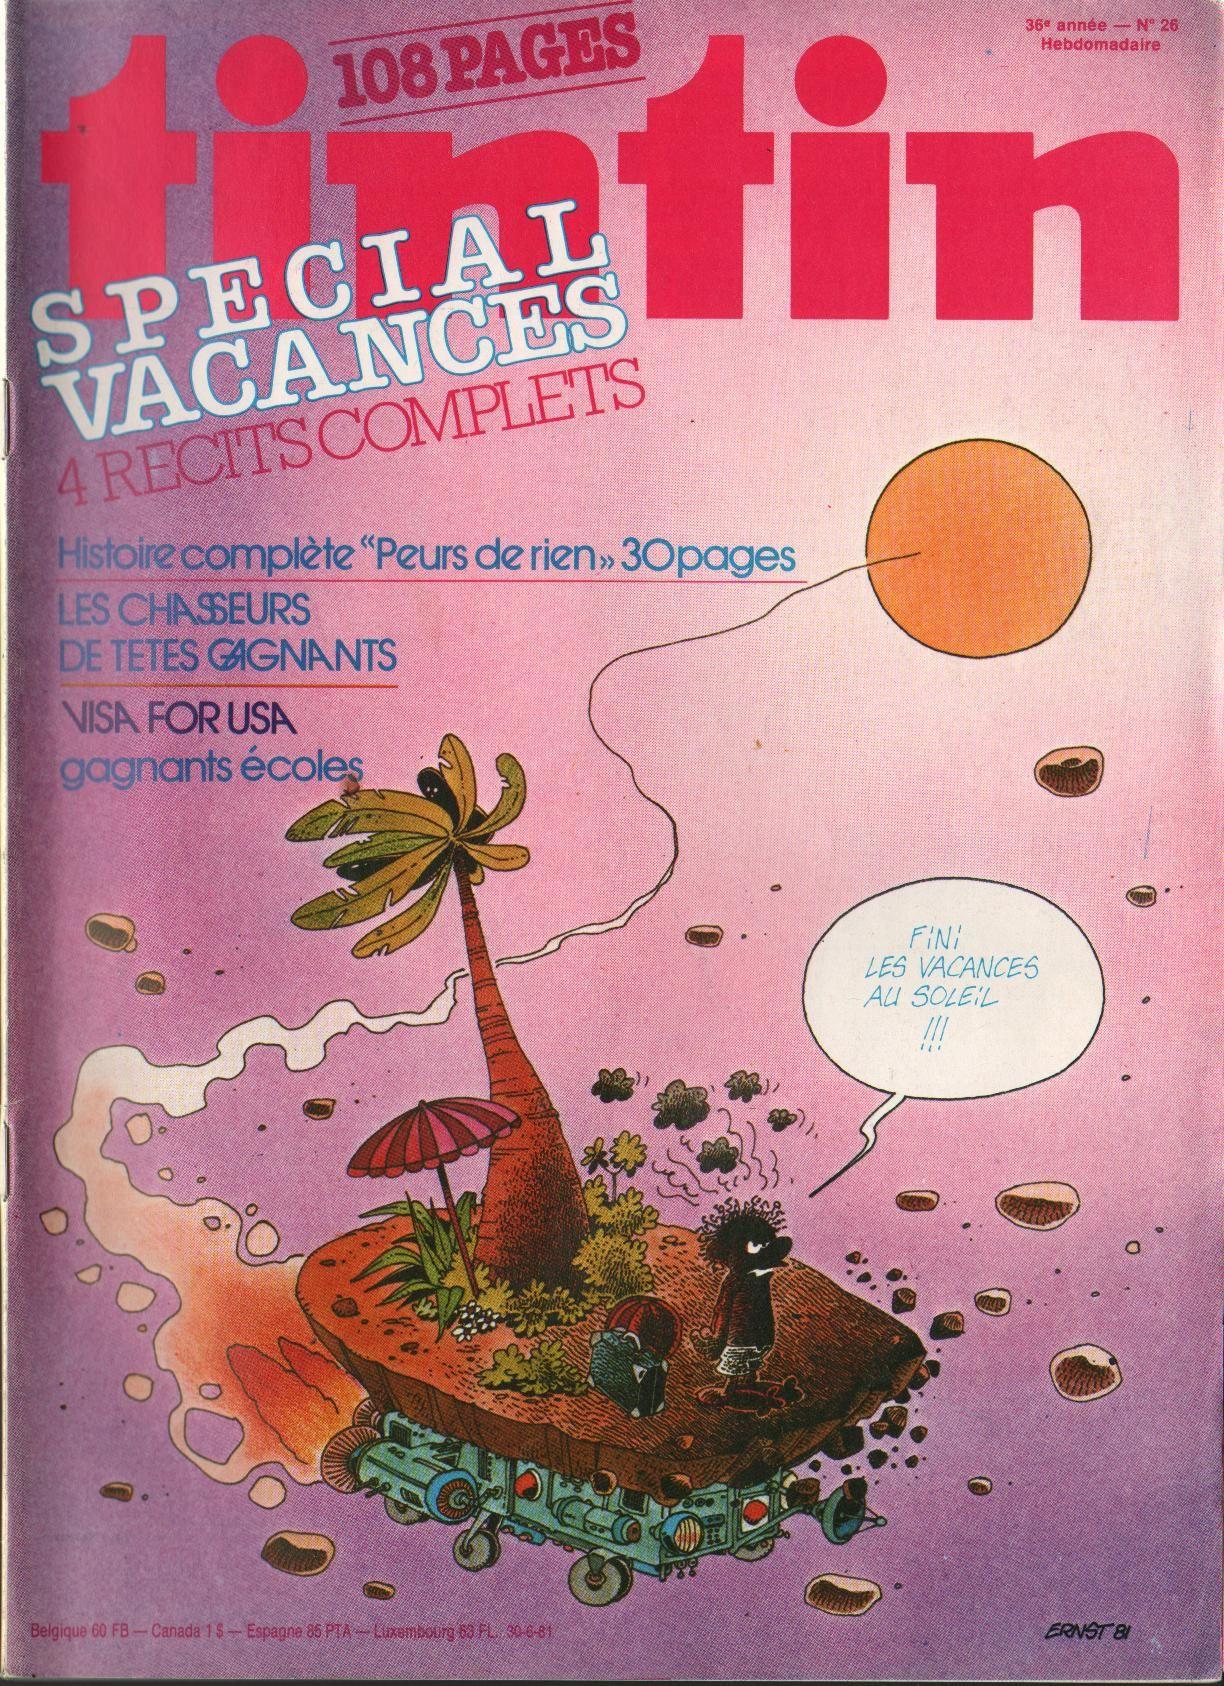 Le Journal de Tintin - Edition Belge - N°  1815 - 1981-26 - Mardi 30 Juin 1981 - Couverture : Serge Ernst